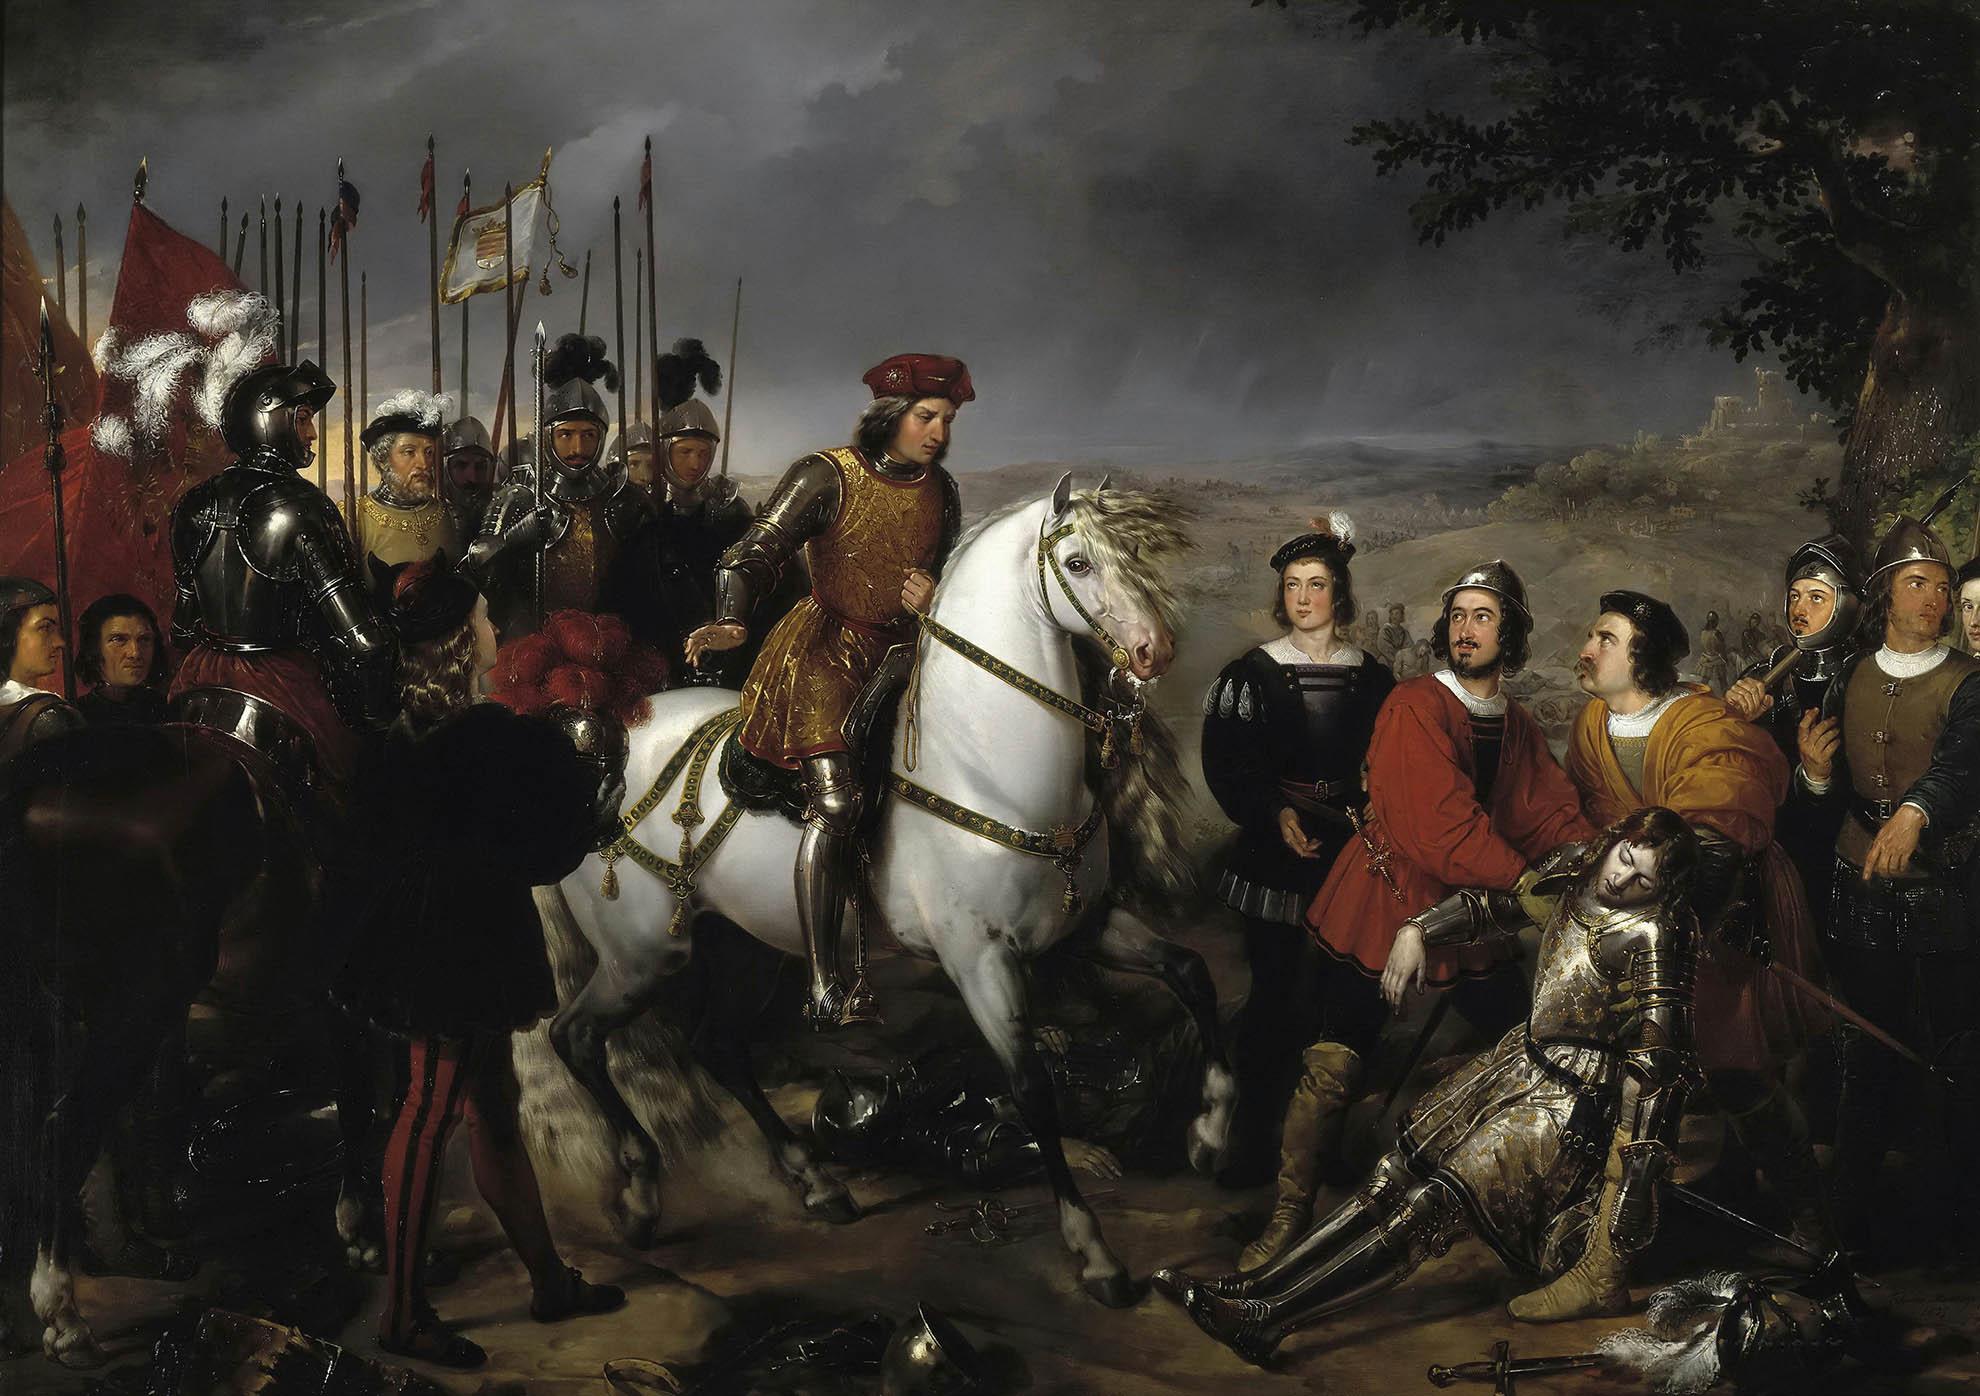 Del Cid a Blas de Lezo, trece libros sobre grandes militares españoles